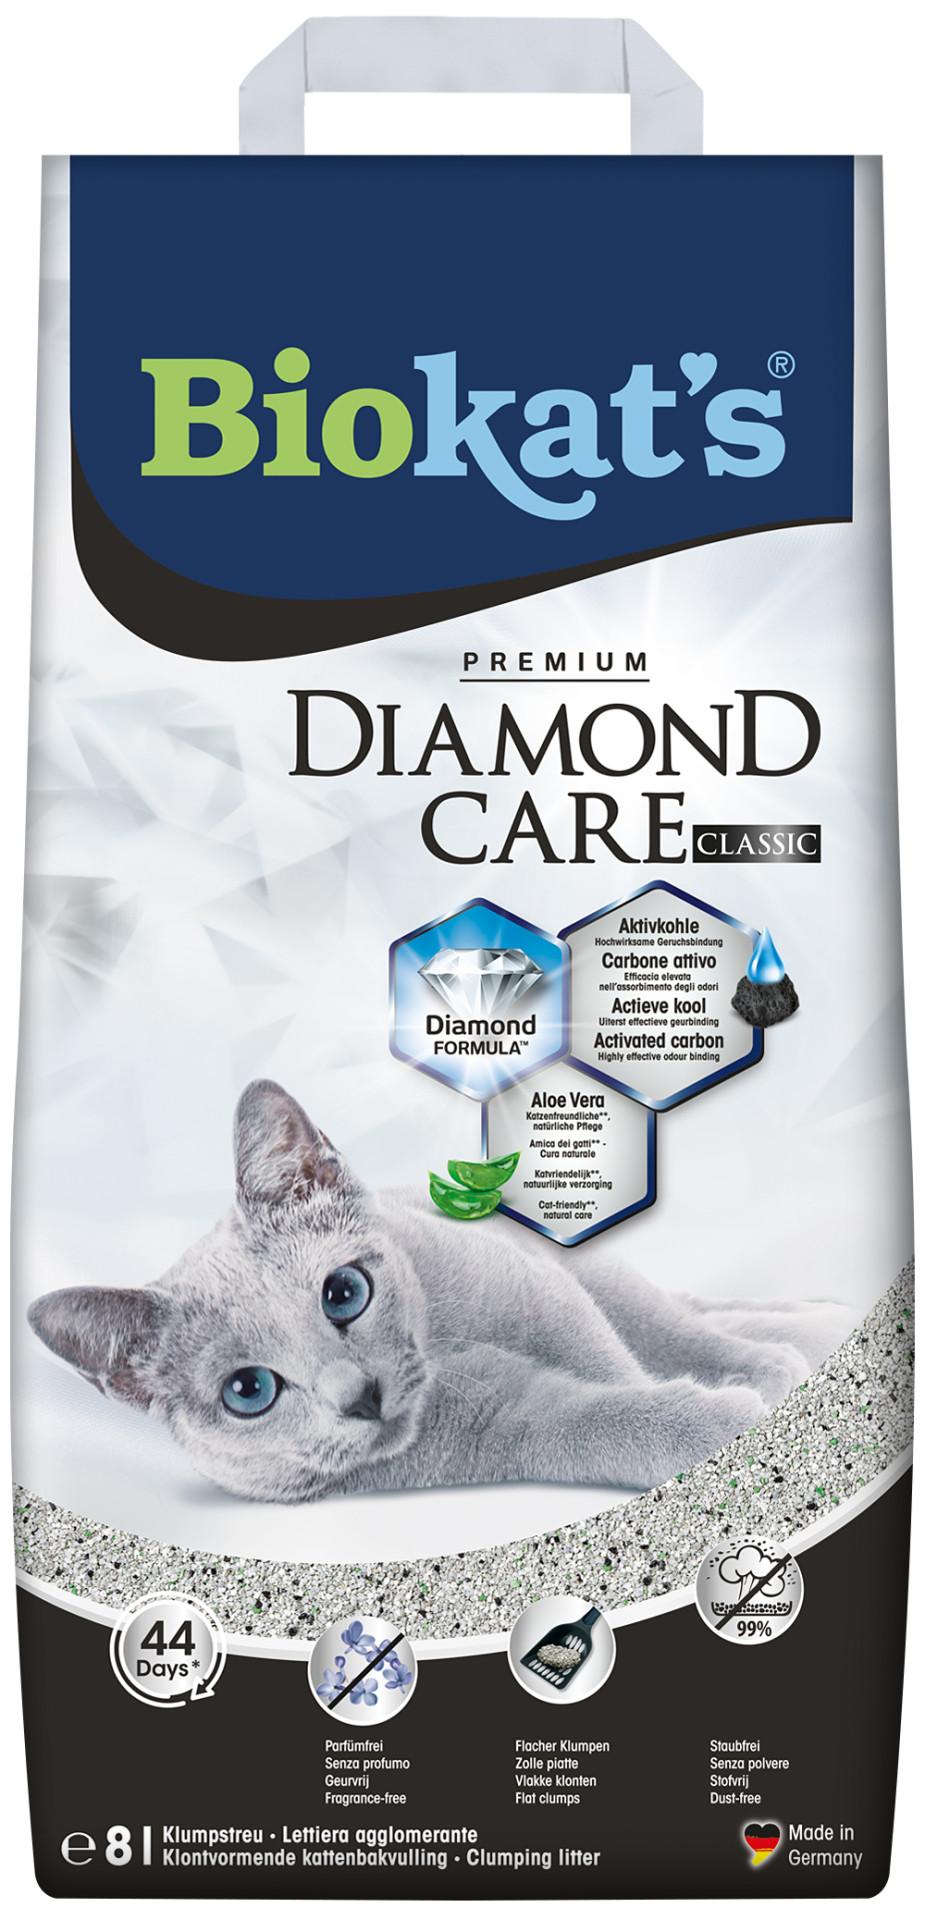 Biokat's Diamond Care Classic 8 ltr